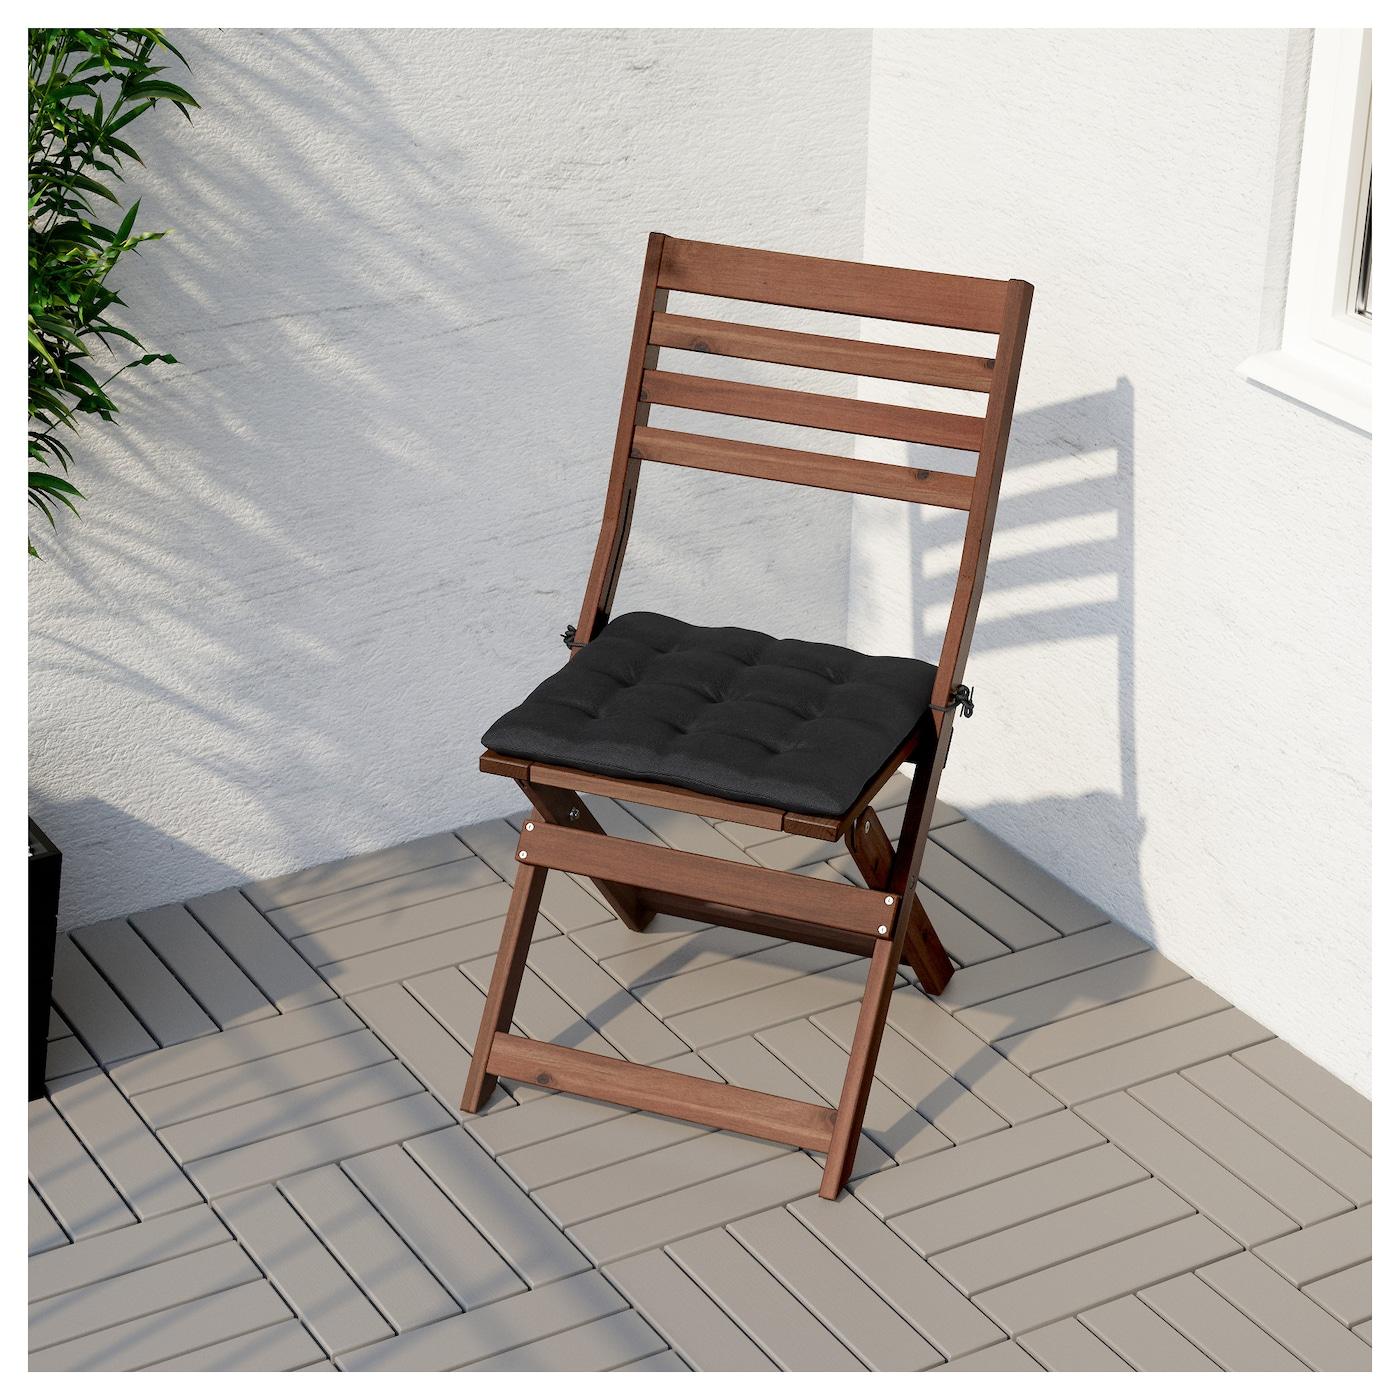 ikea chair cushion washing instructions 25 best chair cushion